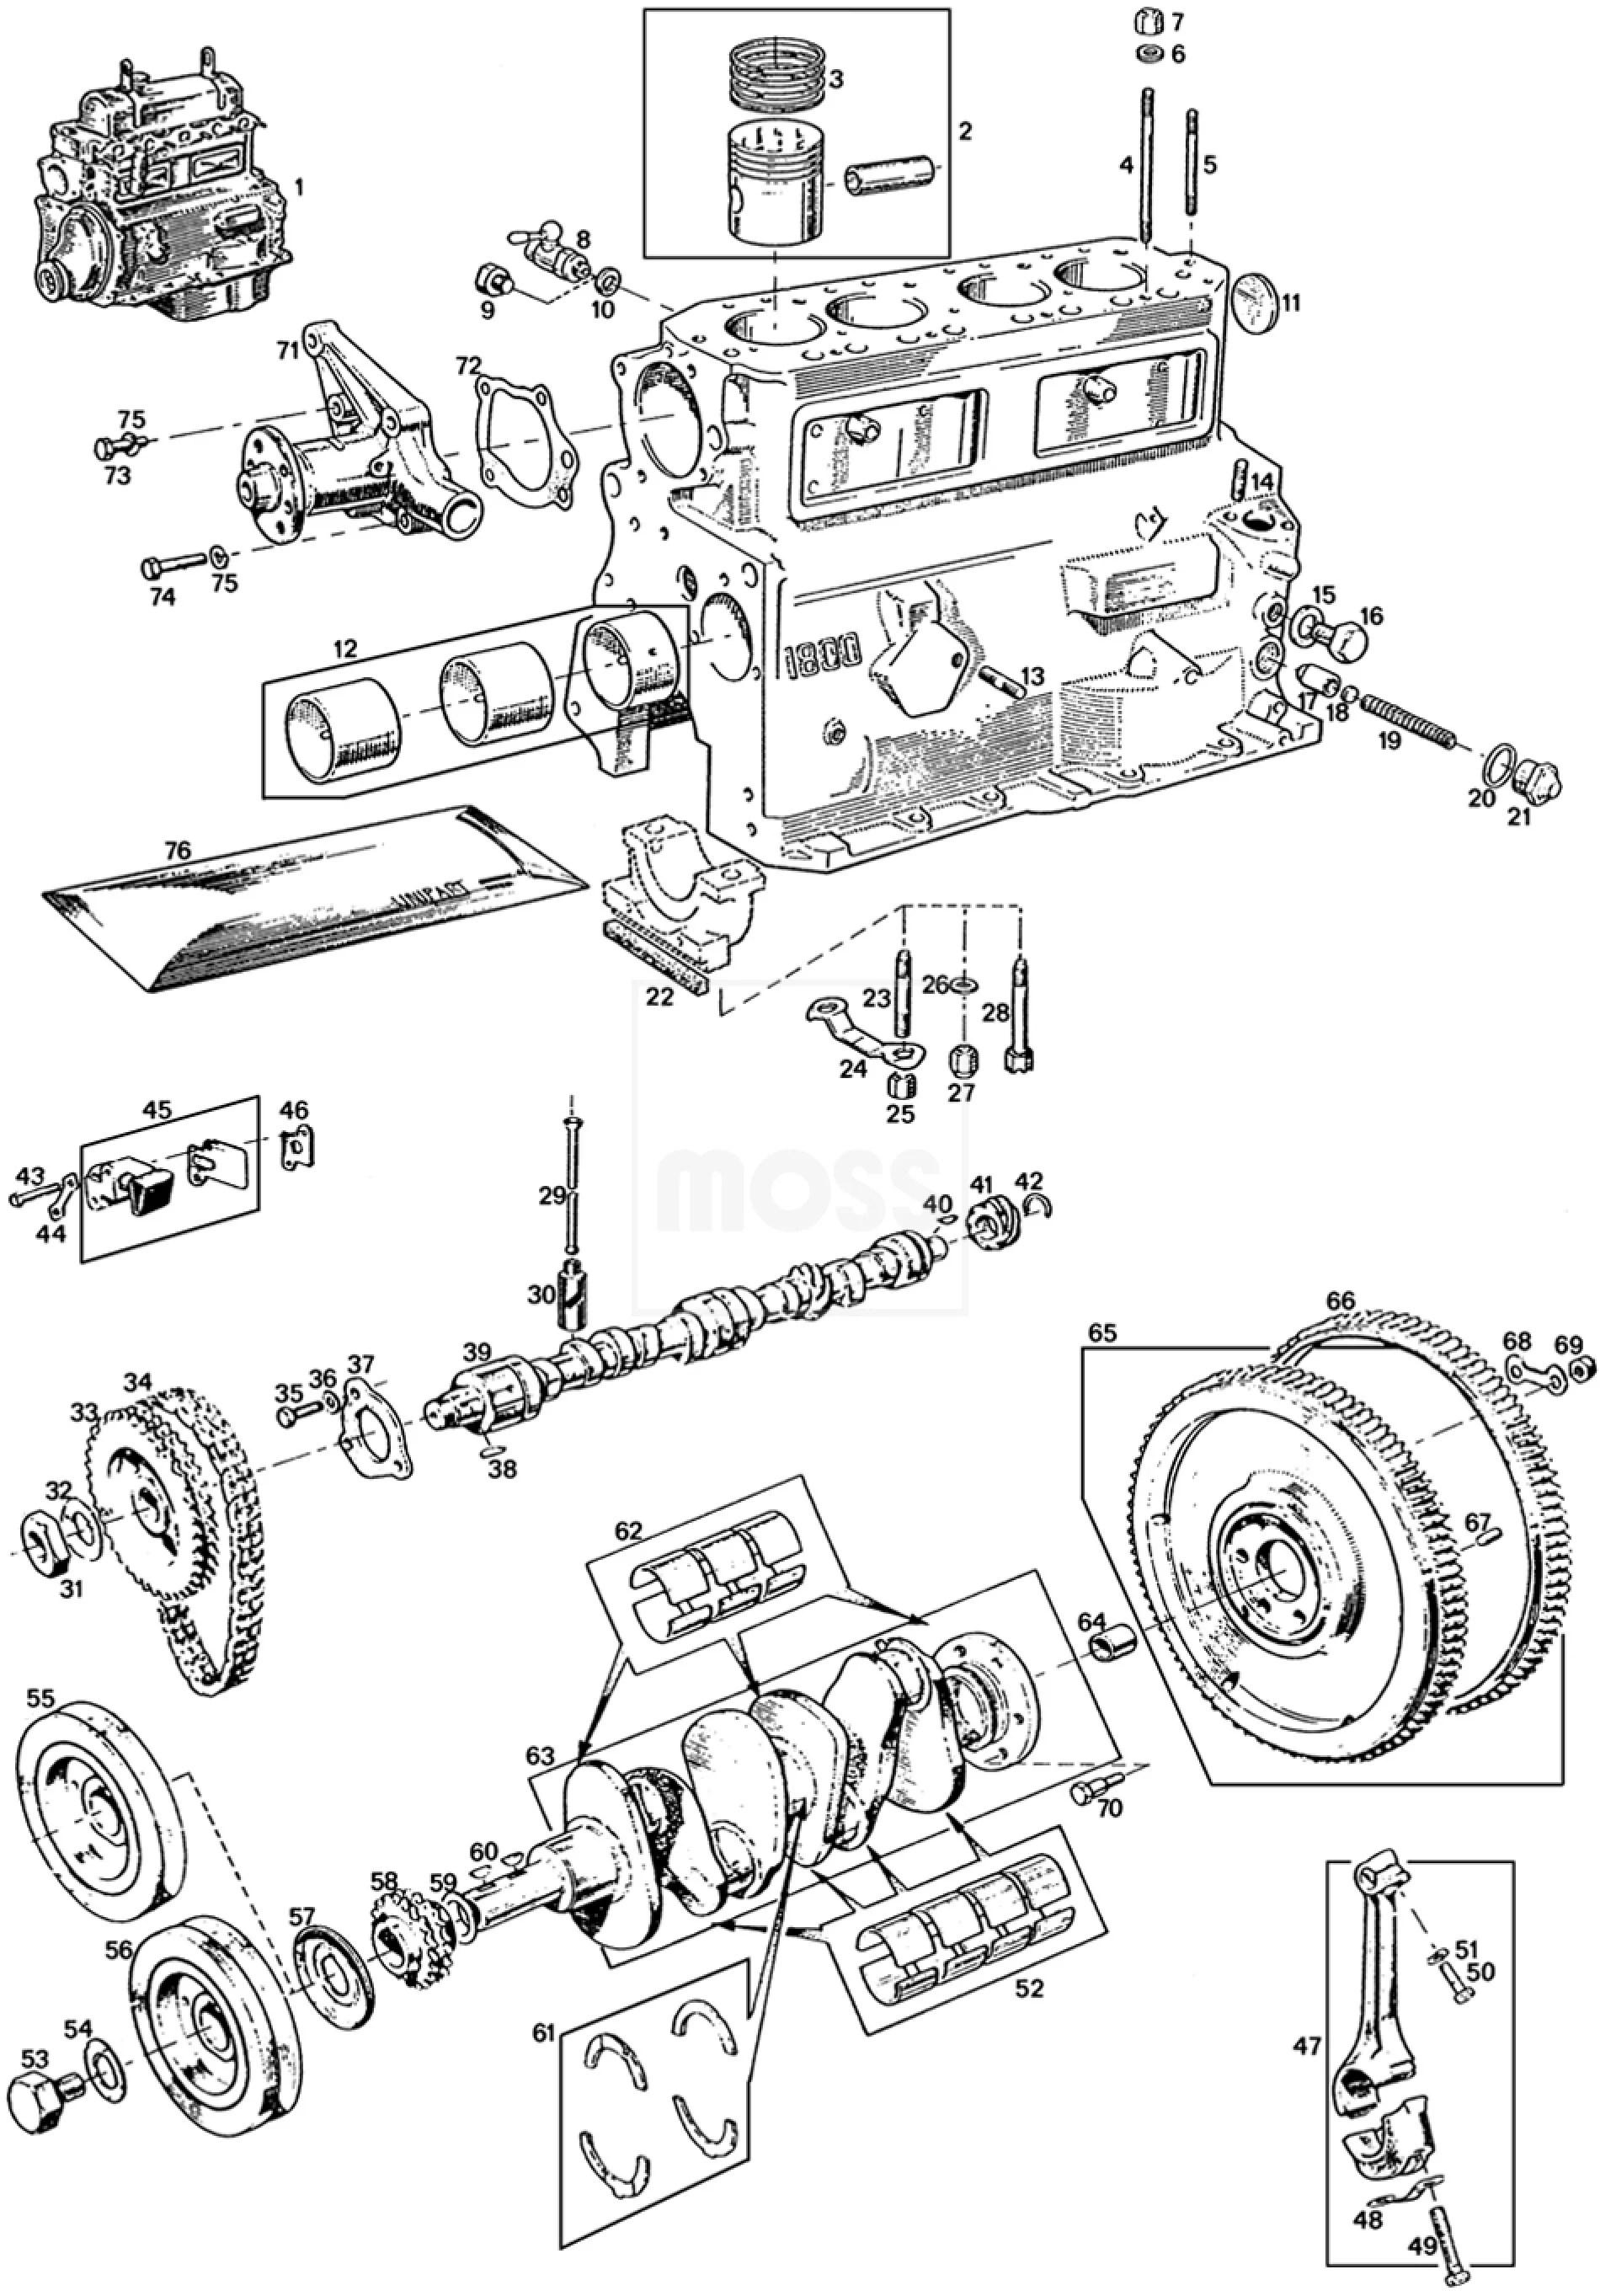 medium resolution of mgb c v8 engine engines components external internal engine 3 main bearing 18g ga mgb